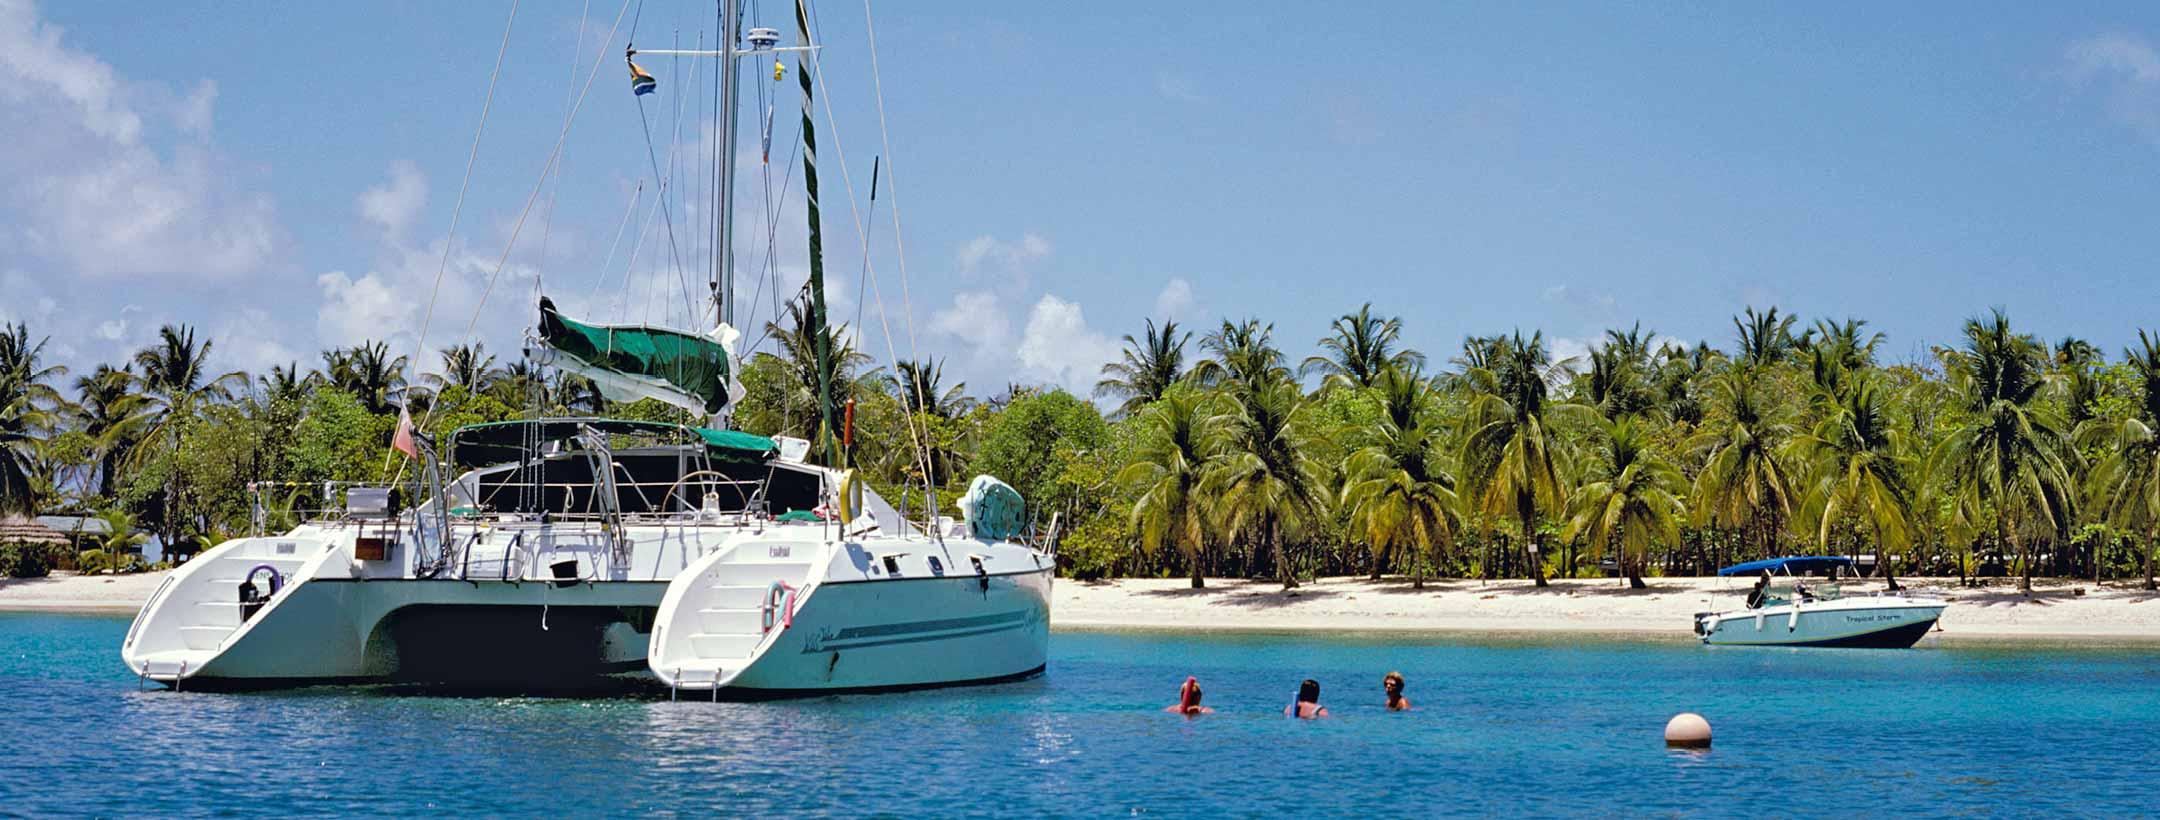 TradeWinds Privilege 51 Cruising Class Yacht stern